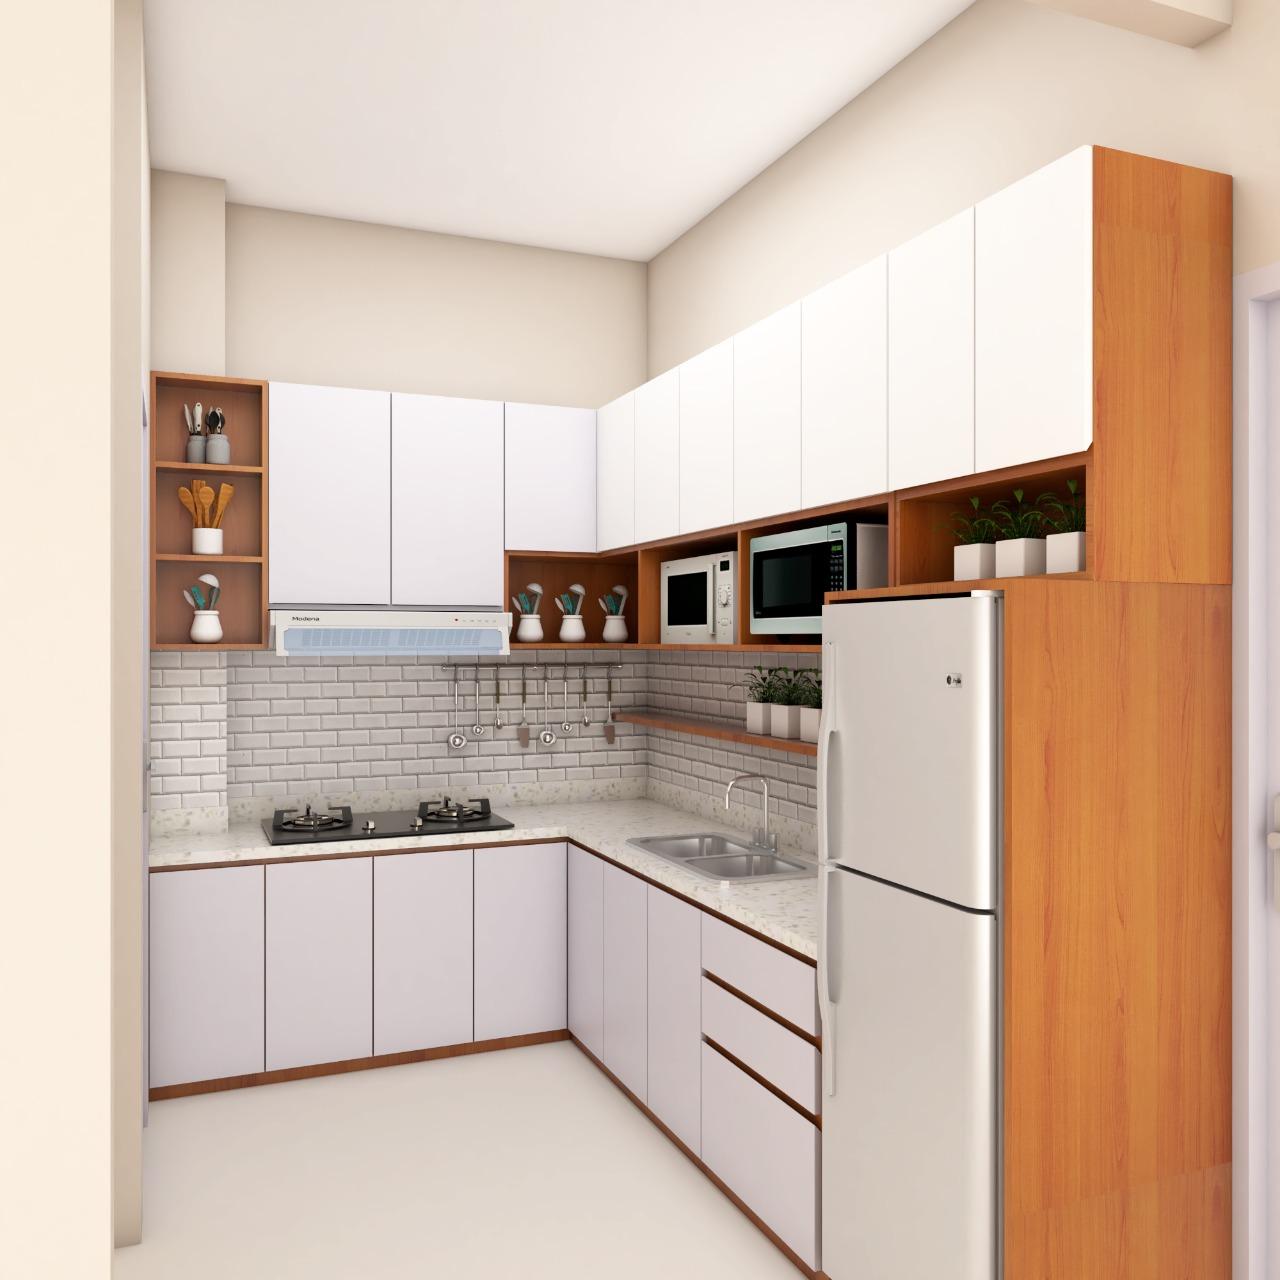 Kitchen Set Modern Minimalist Di Jakarta Timur Mozaik Furniture Design And Build